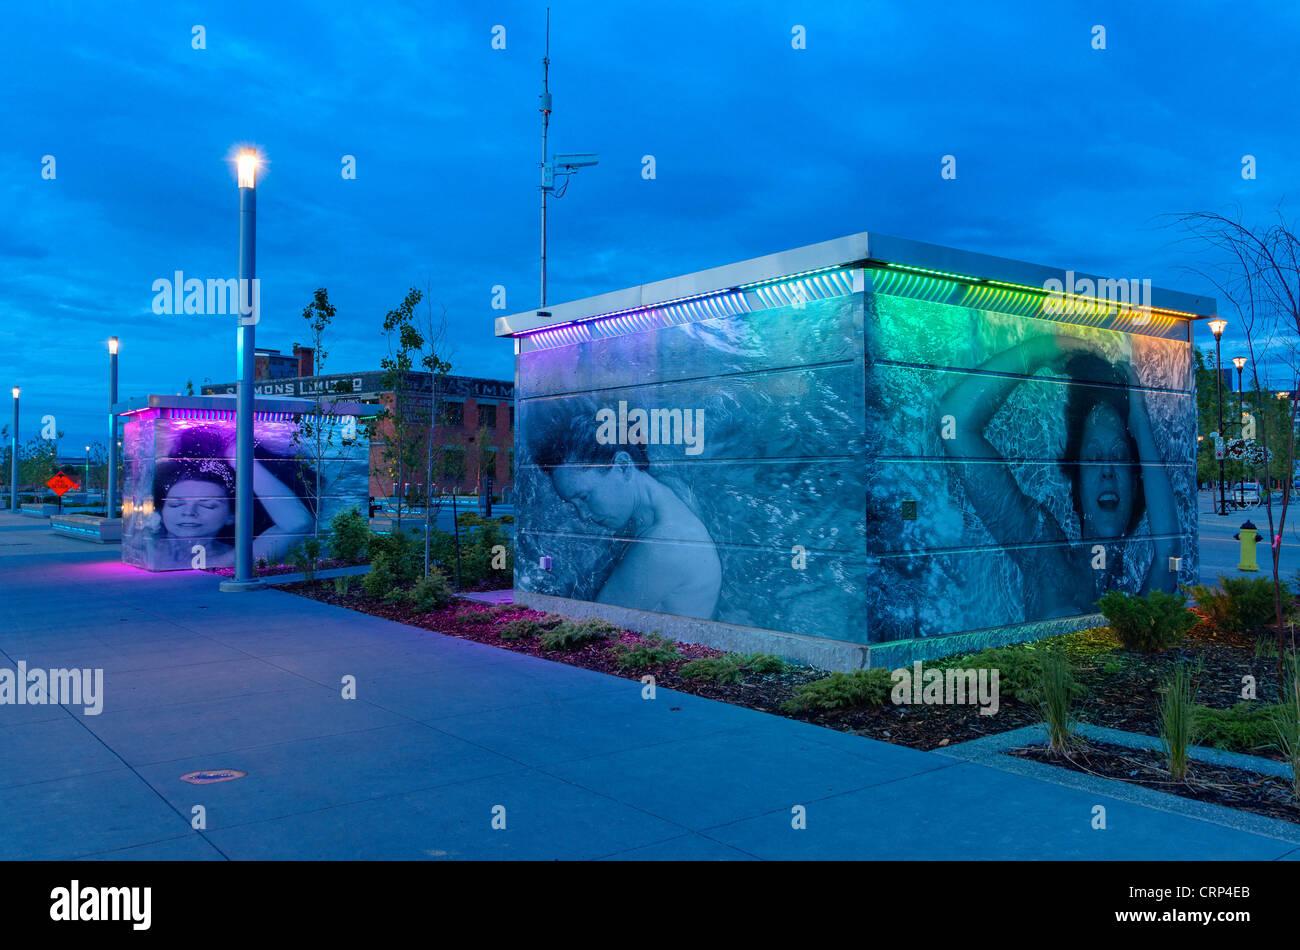 Arty, controversé, high tech exeloo les toilettes publiques, East Village, Calgary, Alberta, Canada Photo Stock